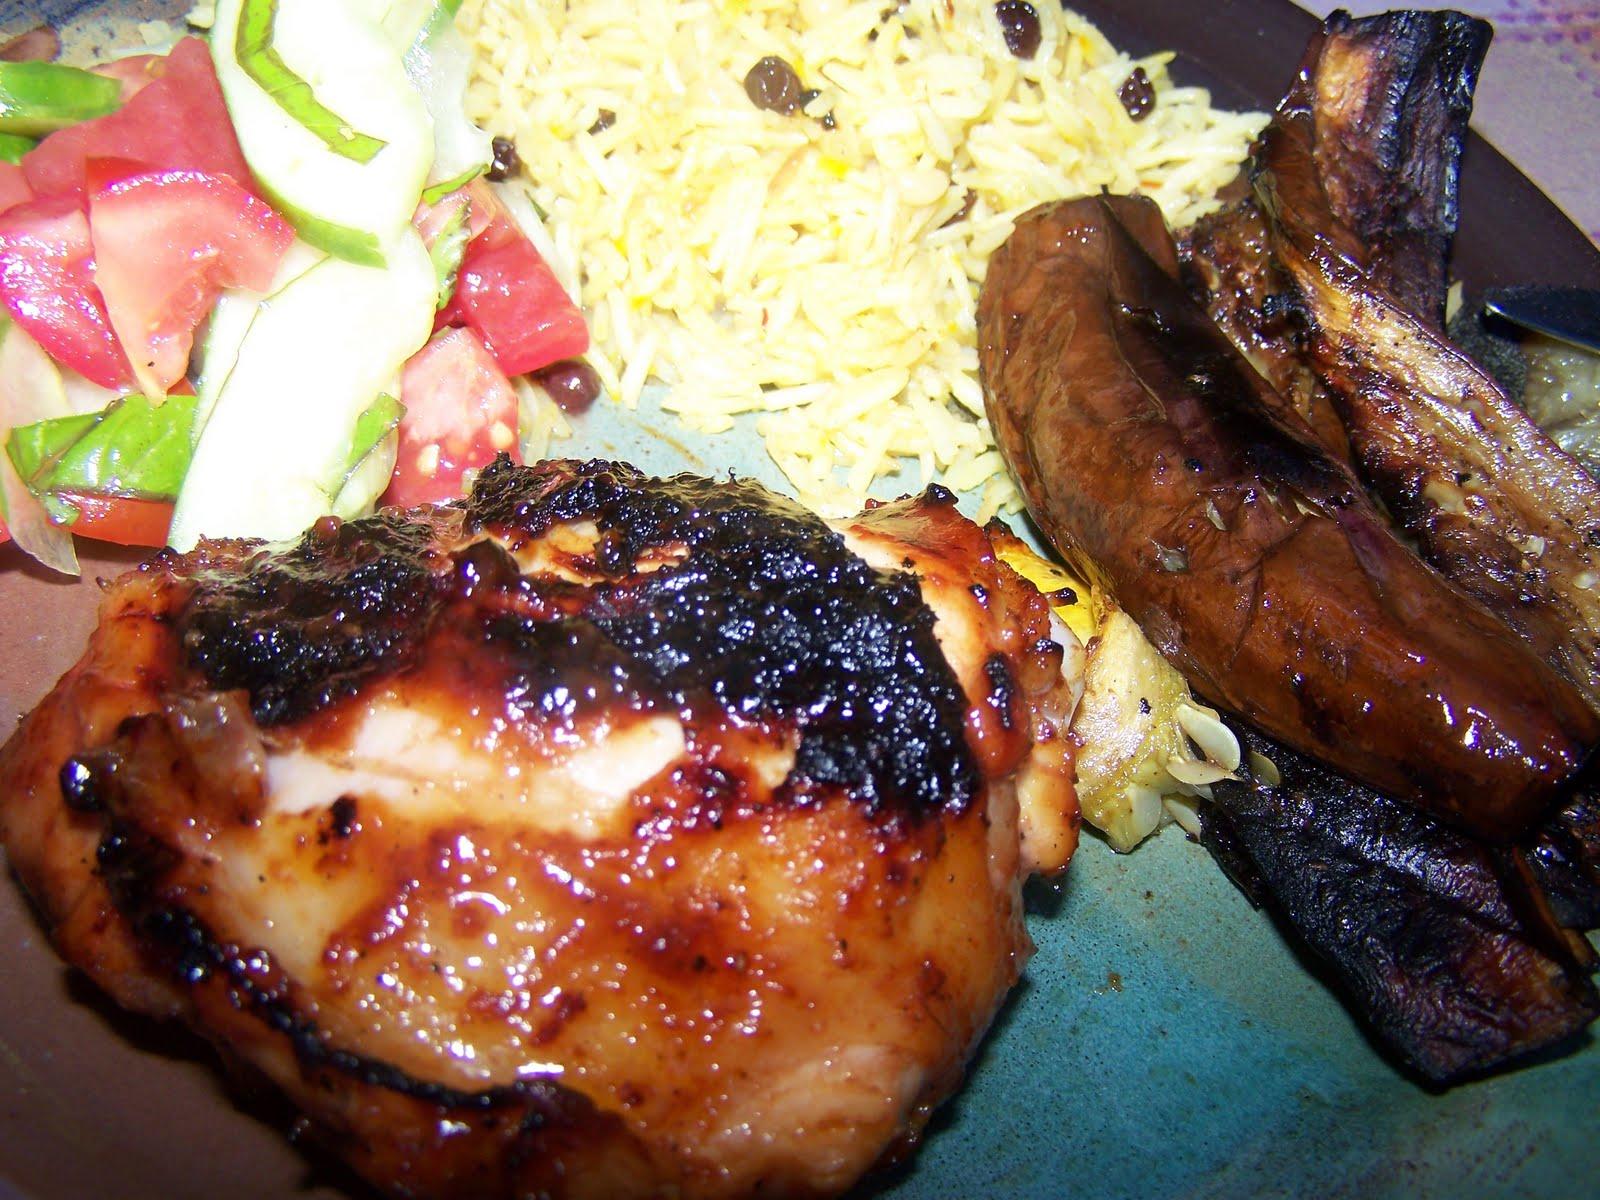 Ken Albala's Food Rant: Foodiephotoblogorrhea